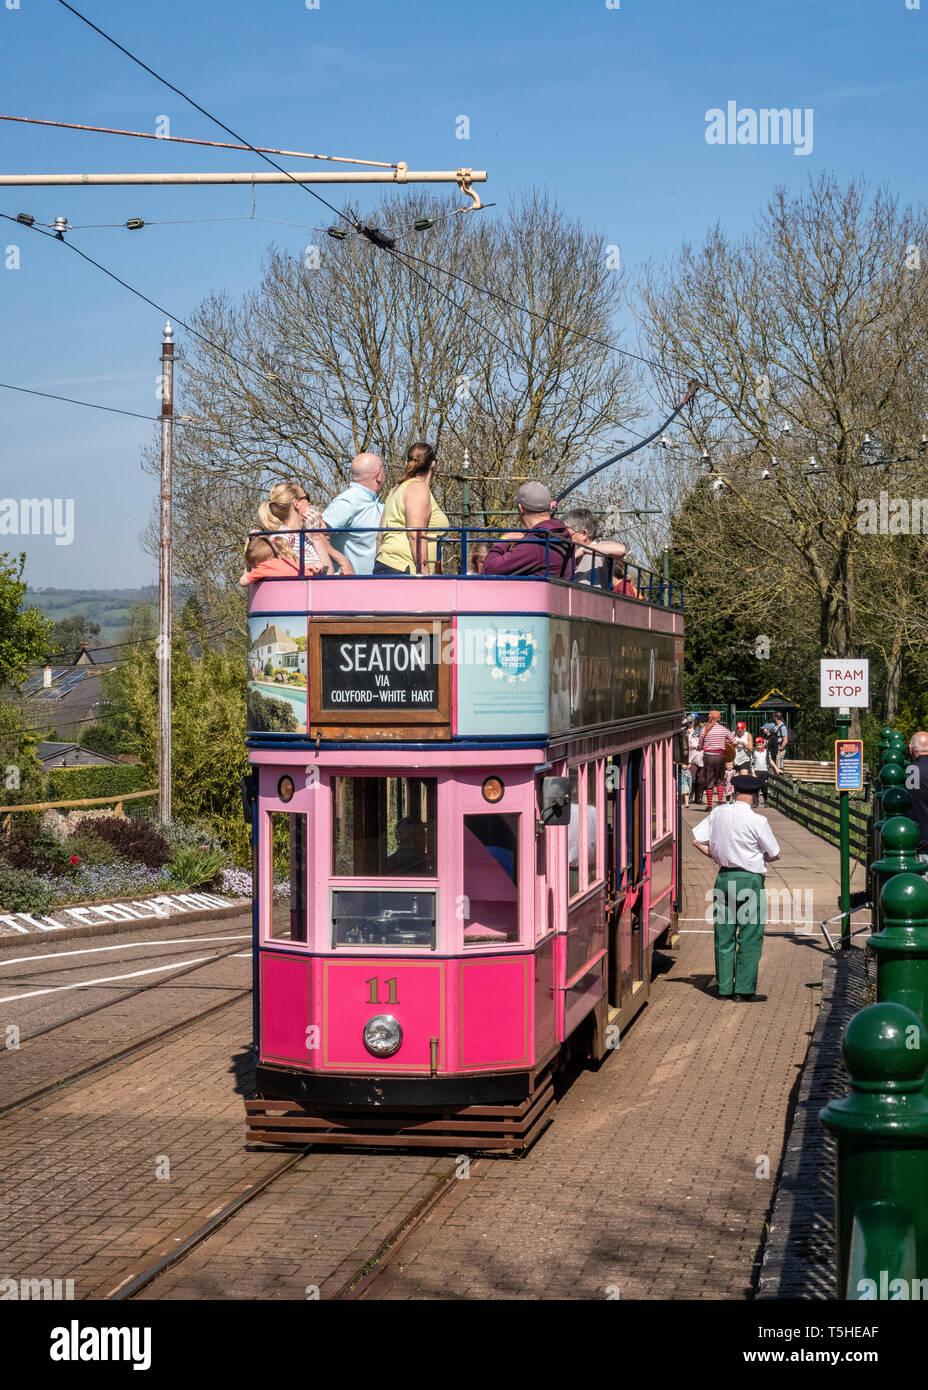 People aboard the Seaton tramway at Colyton Station, Devon, UK Stock Photo